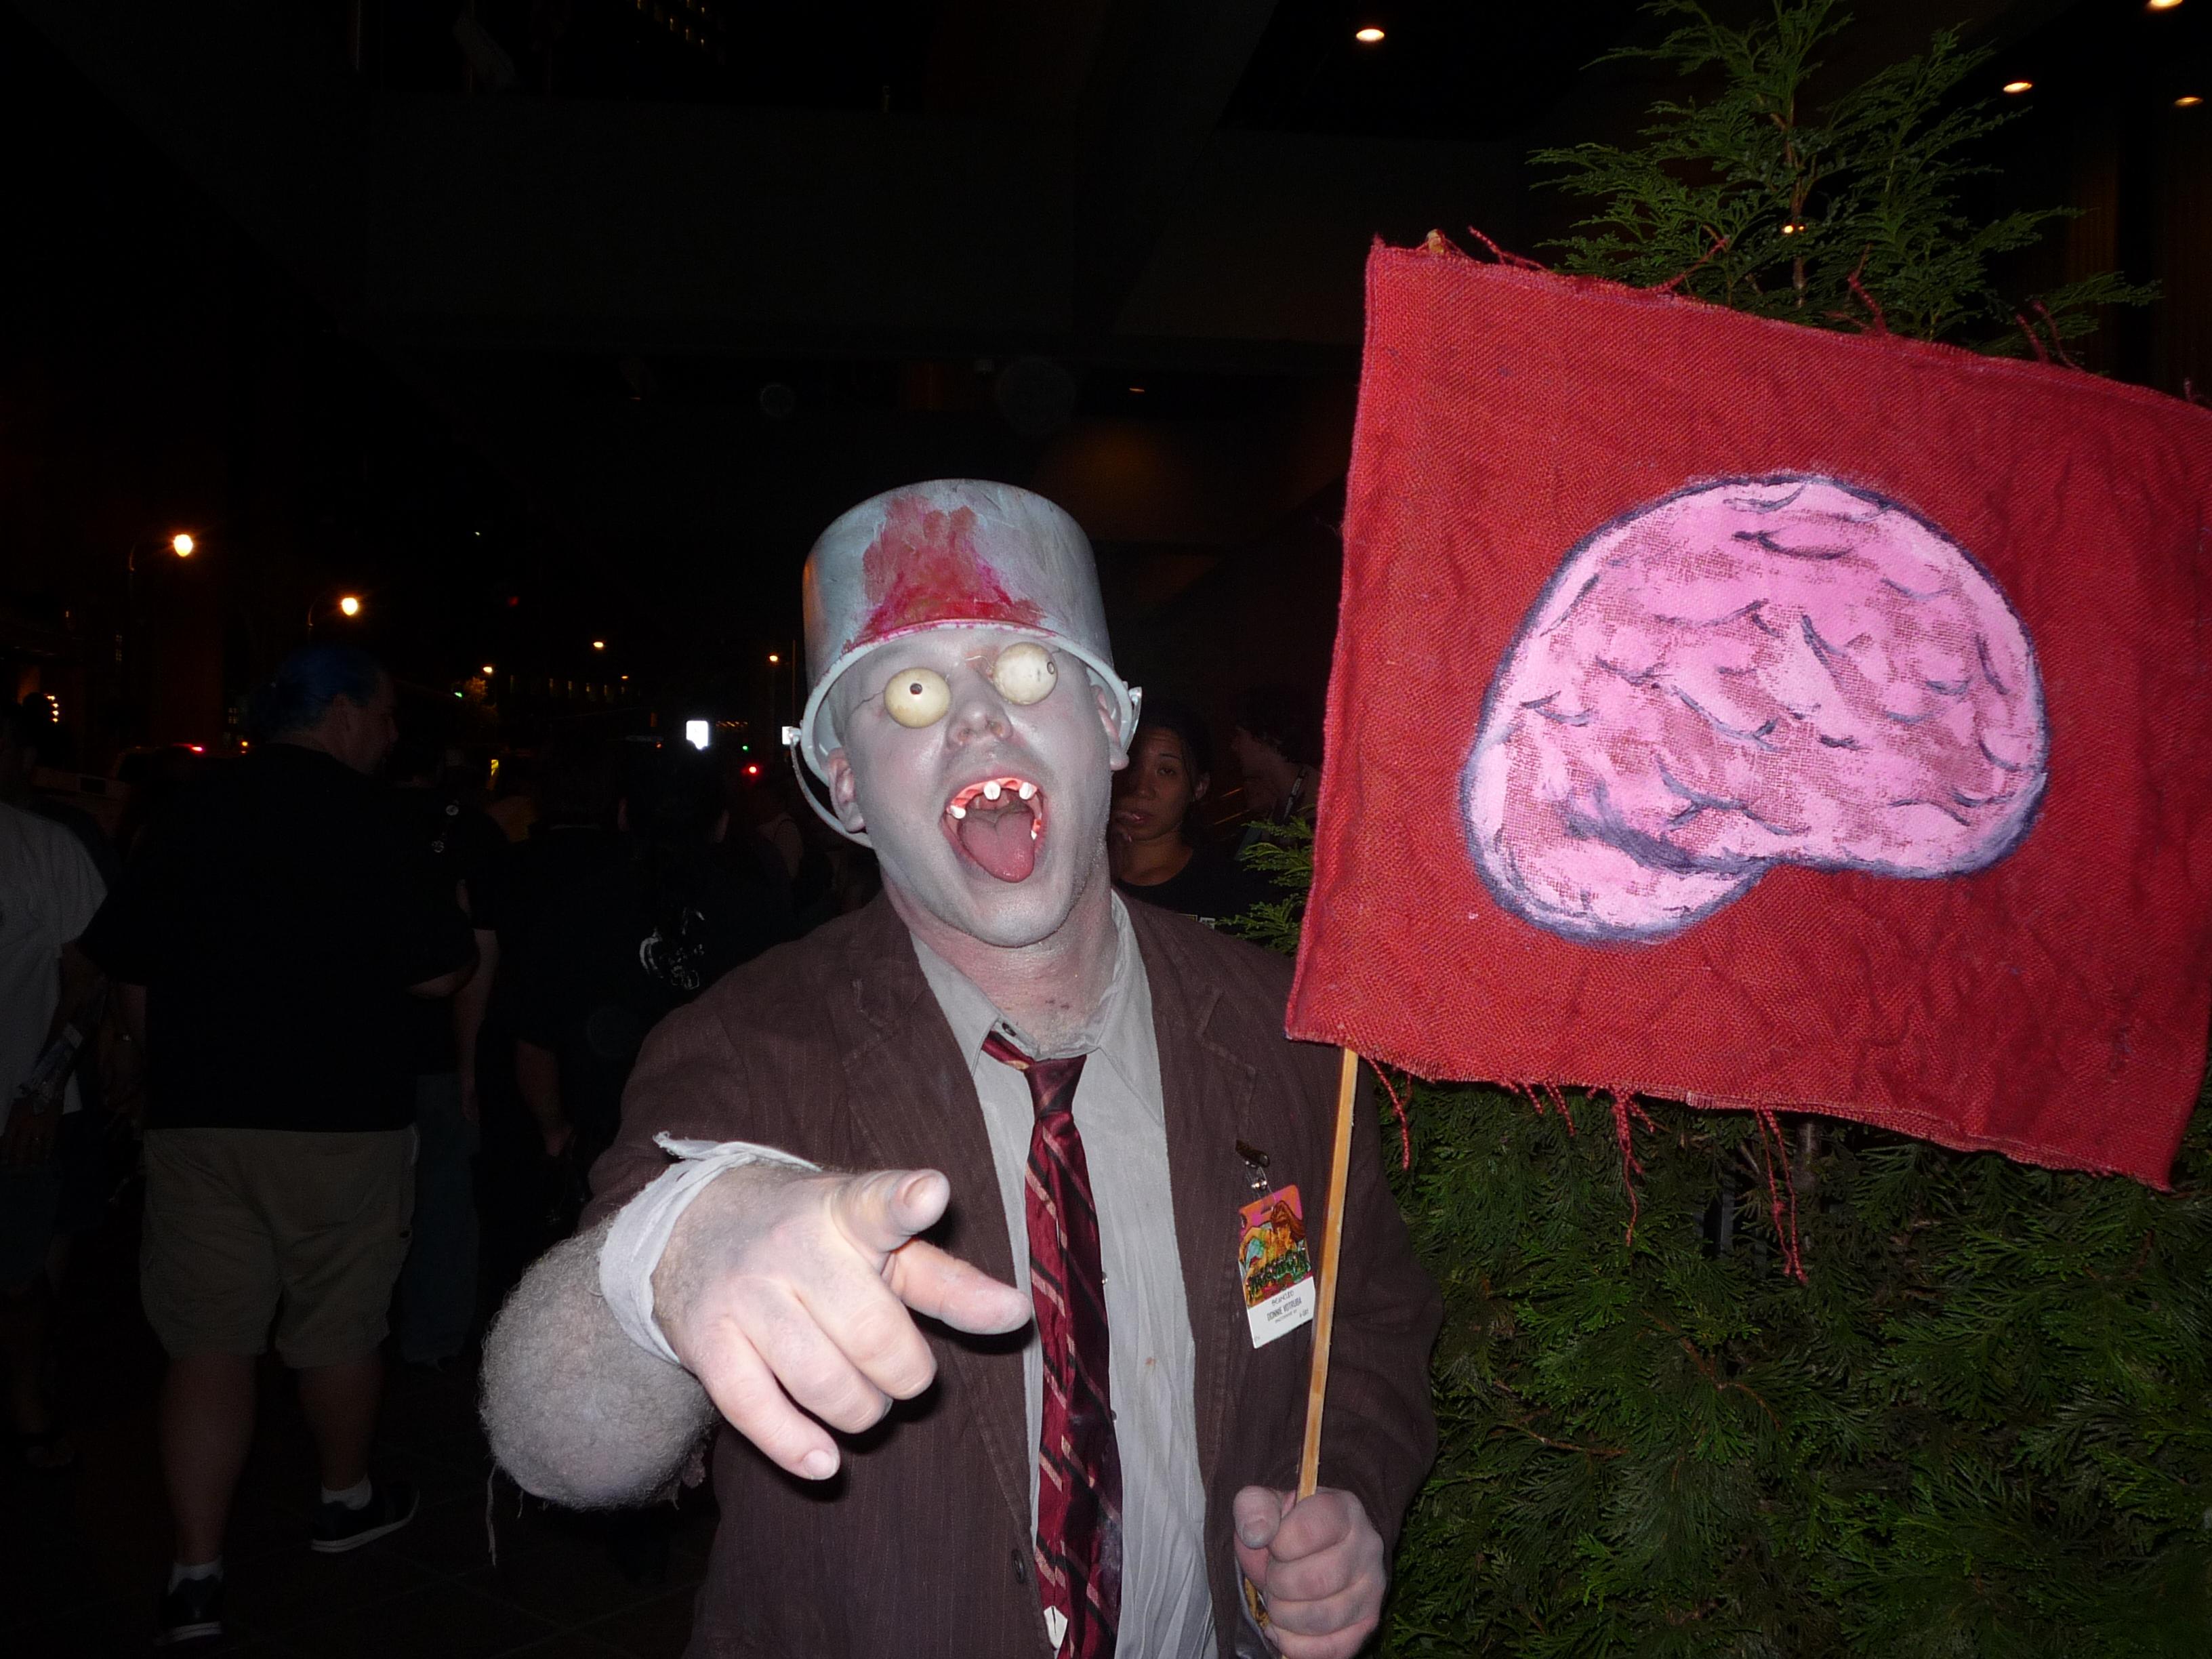 Buckethead zombie from plants vs zombies